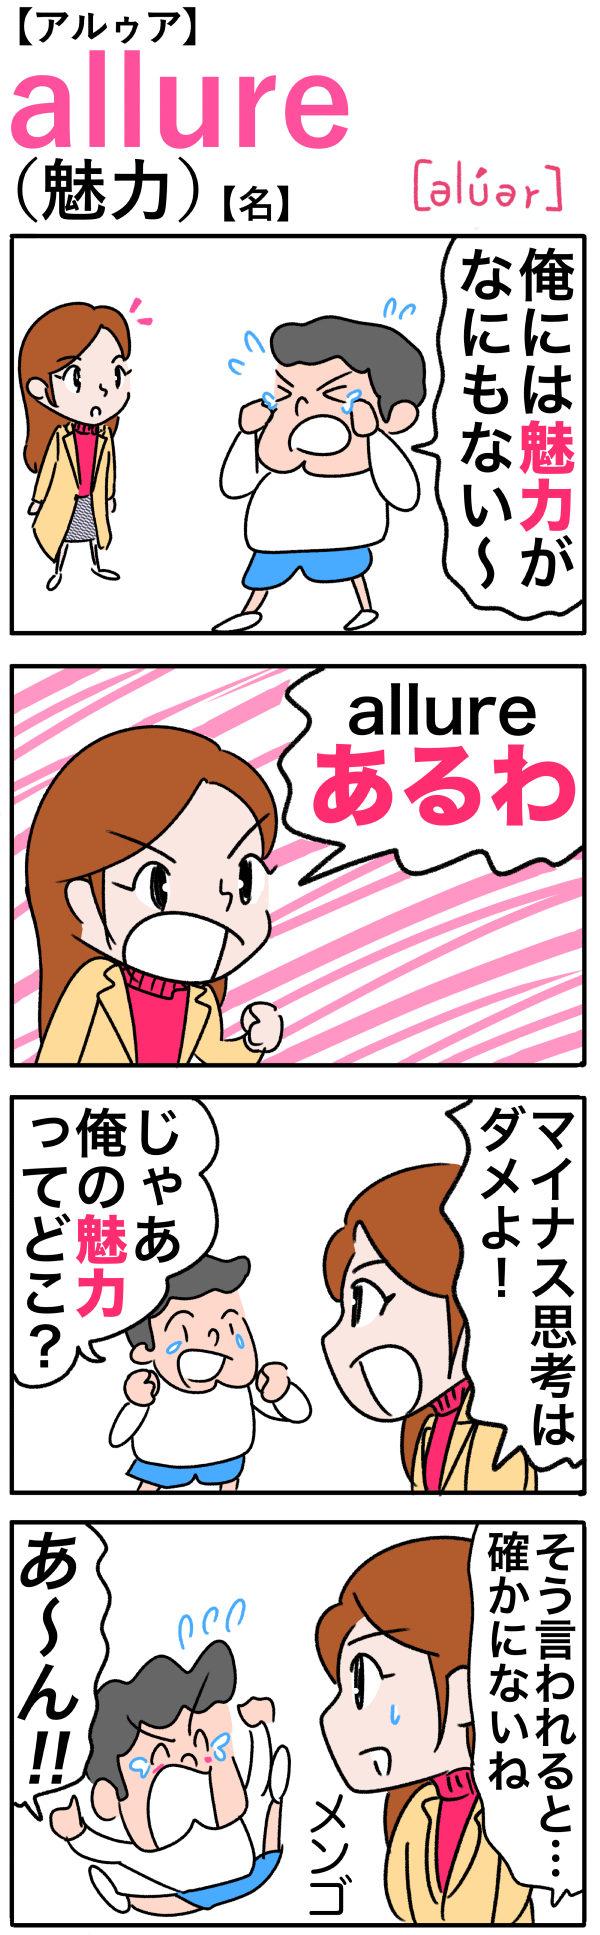 allure(魅力)の語呂合わせ英単語